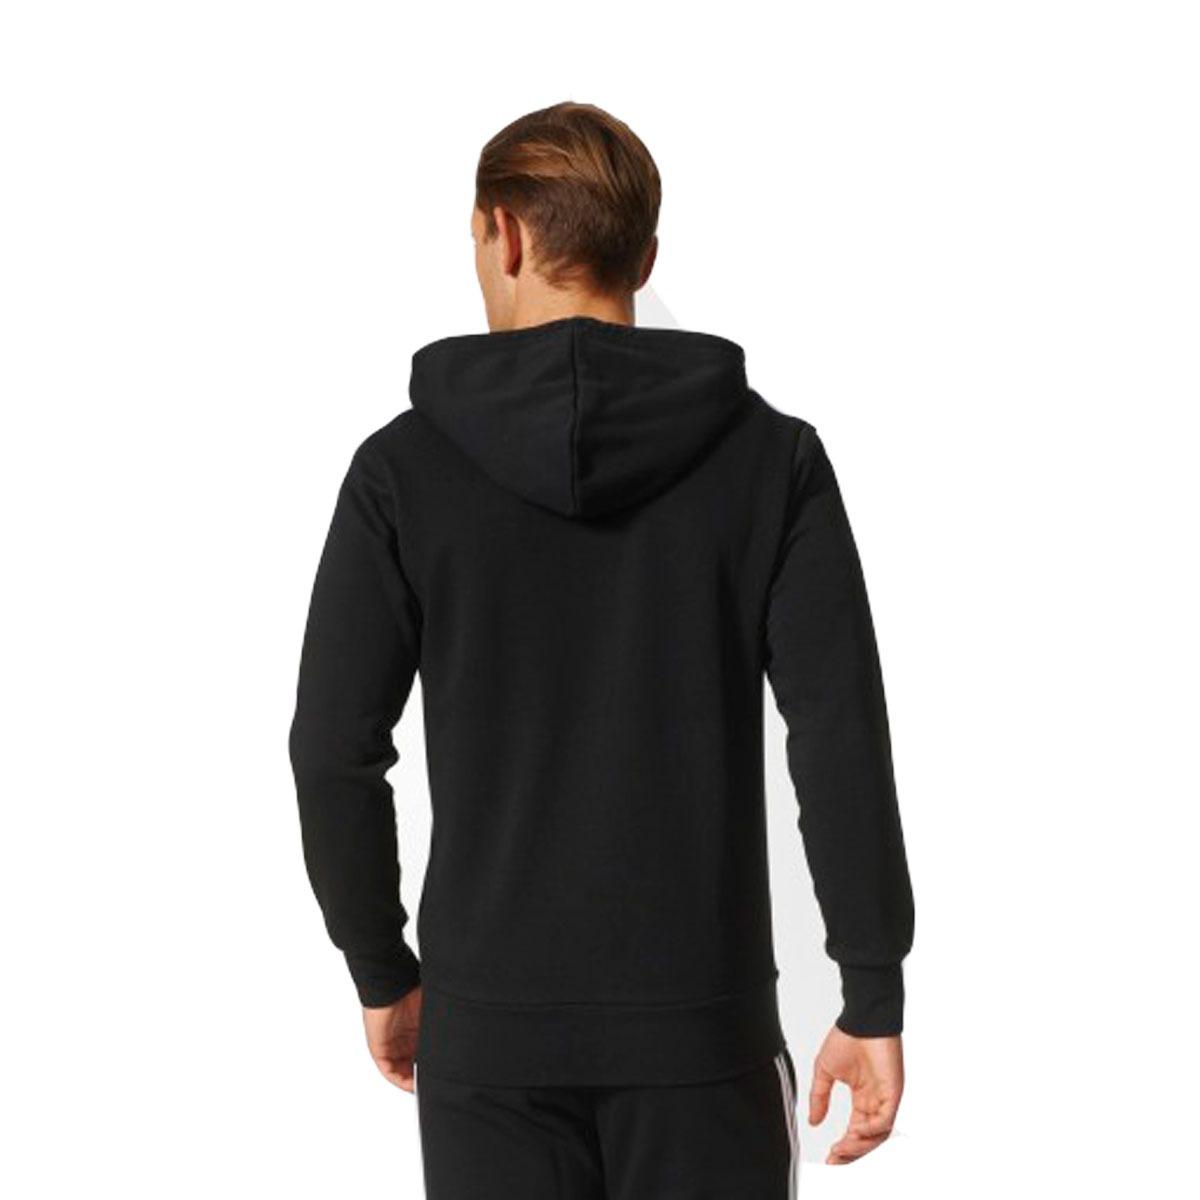 874468c9a93 jaqueta masculina adidas essentials 3s fz hood s98786. Carregando zoom.